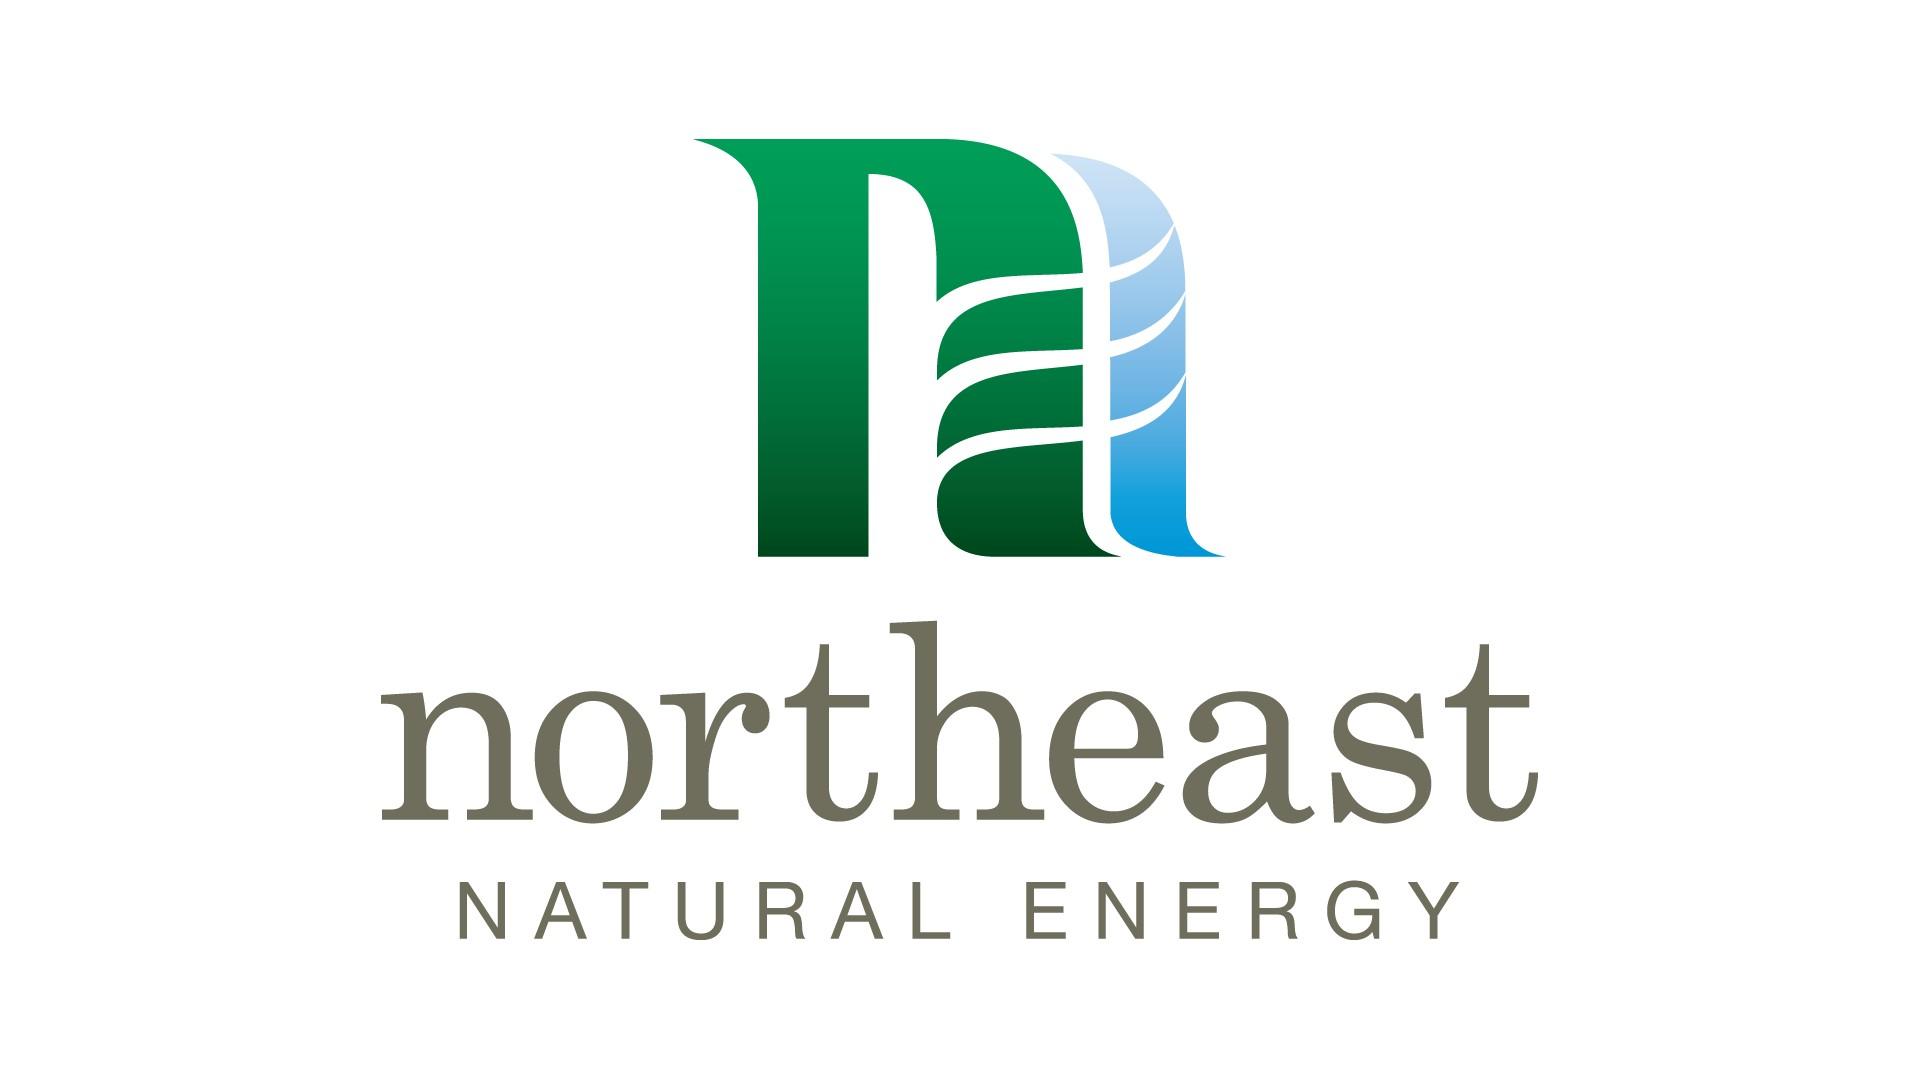 Northeast Natural Energy